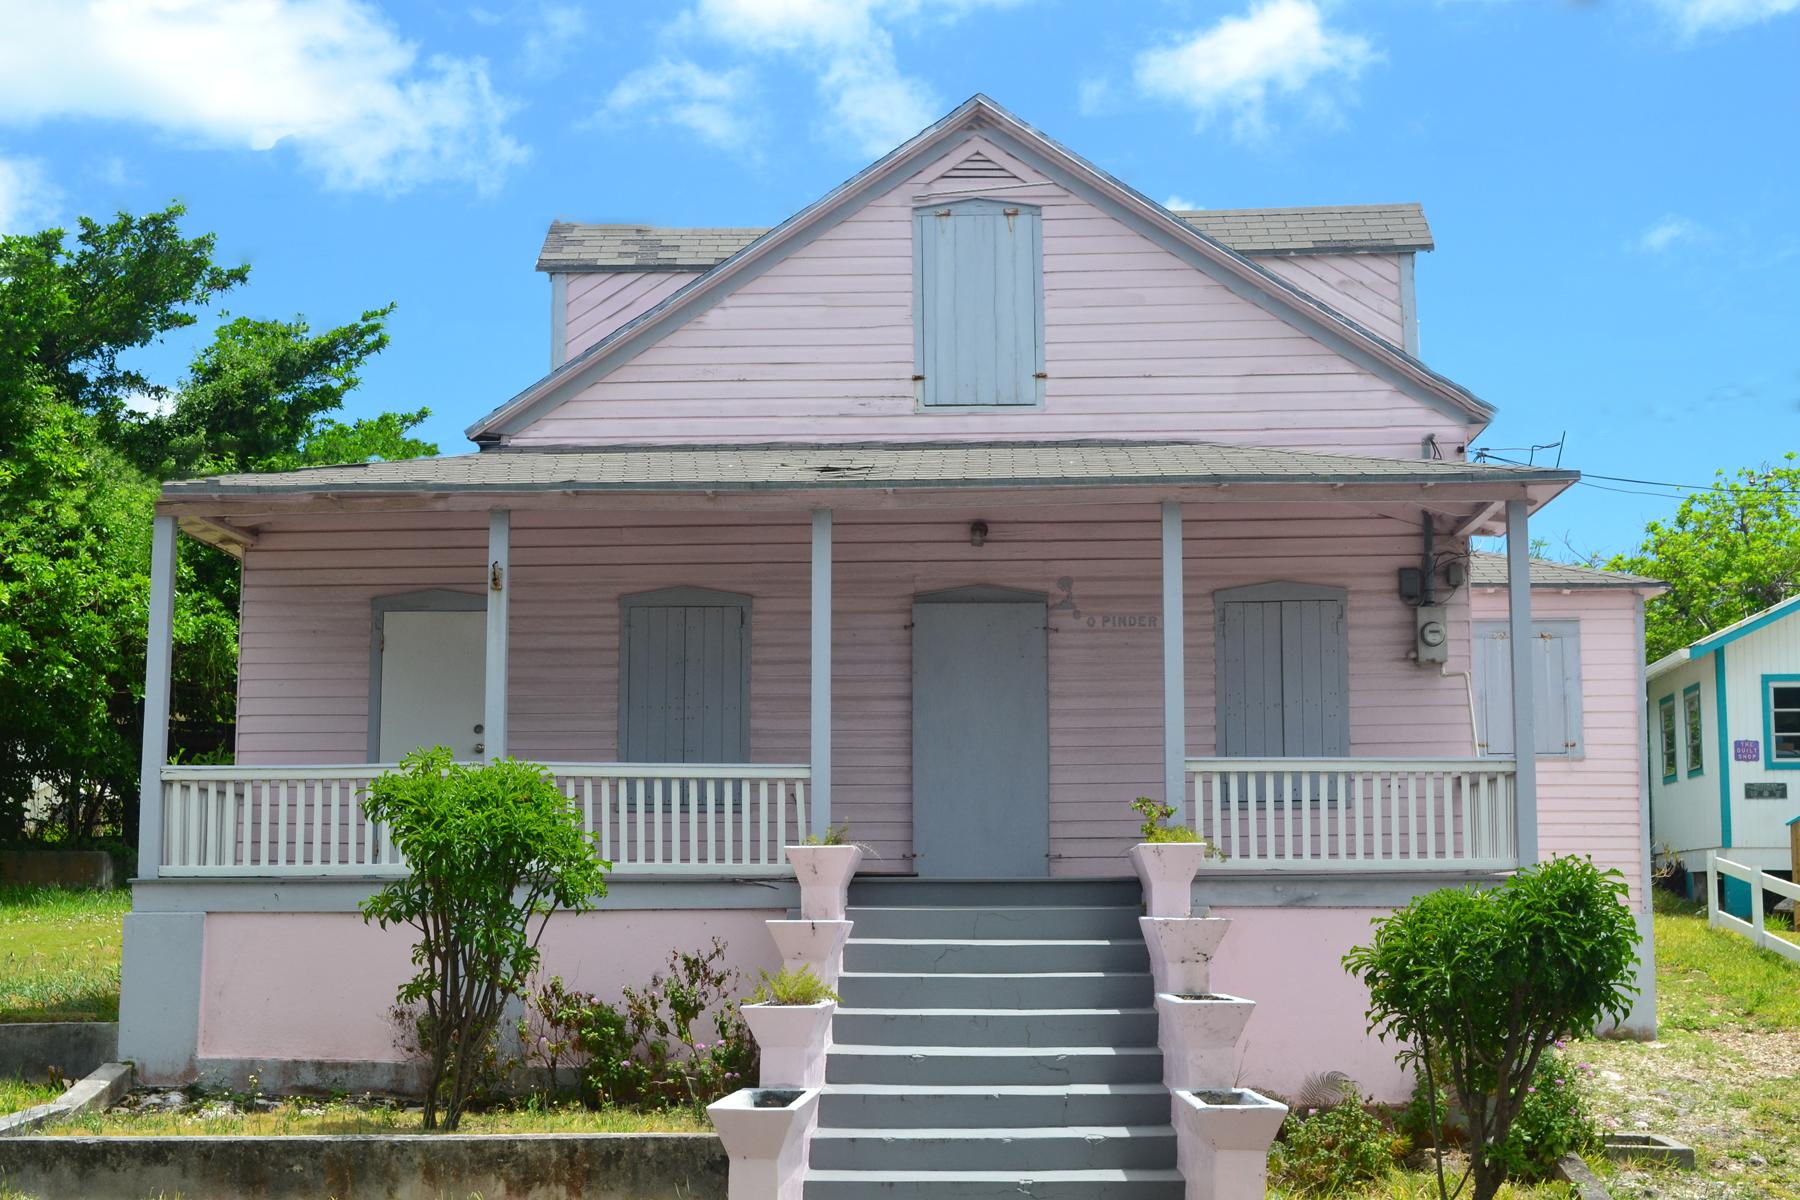 Moradia para Venda às Almost Heaven Spanish Wells, Eleuteria, Bahamas